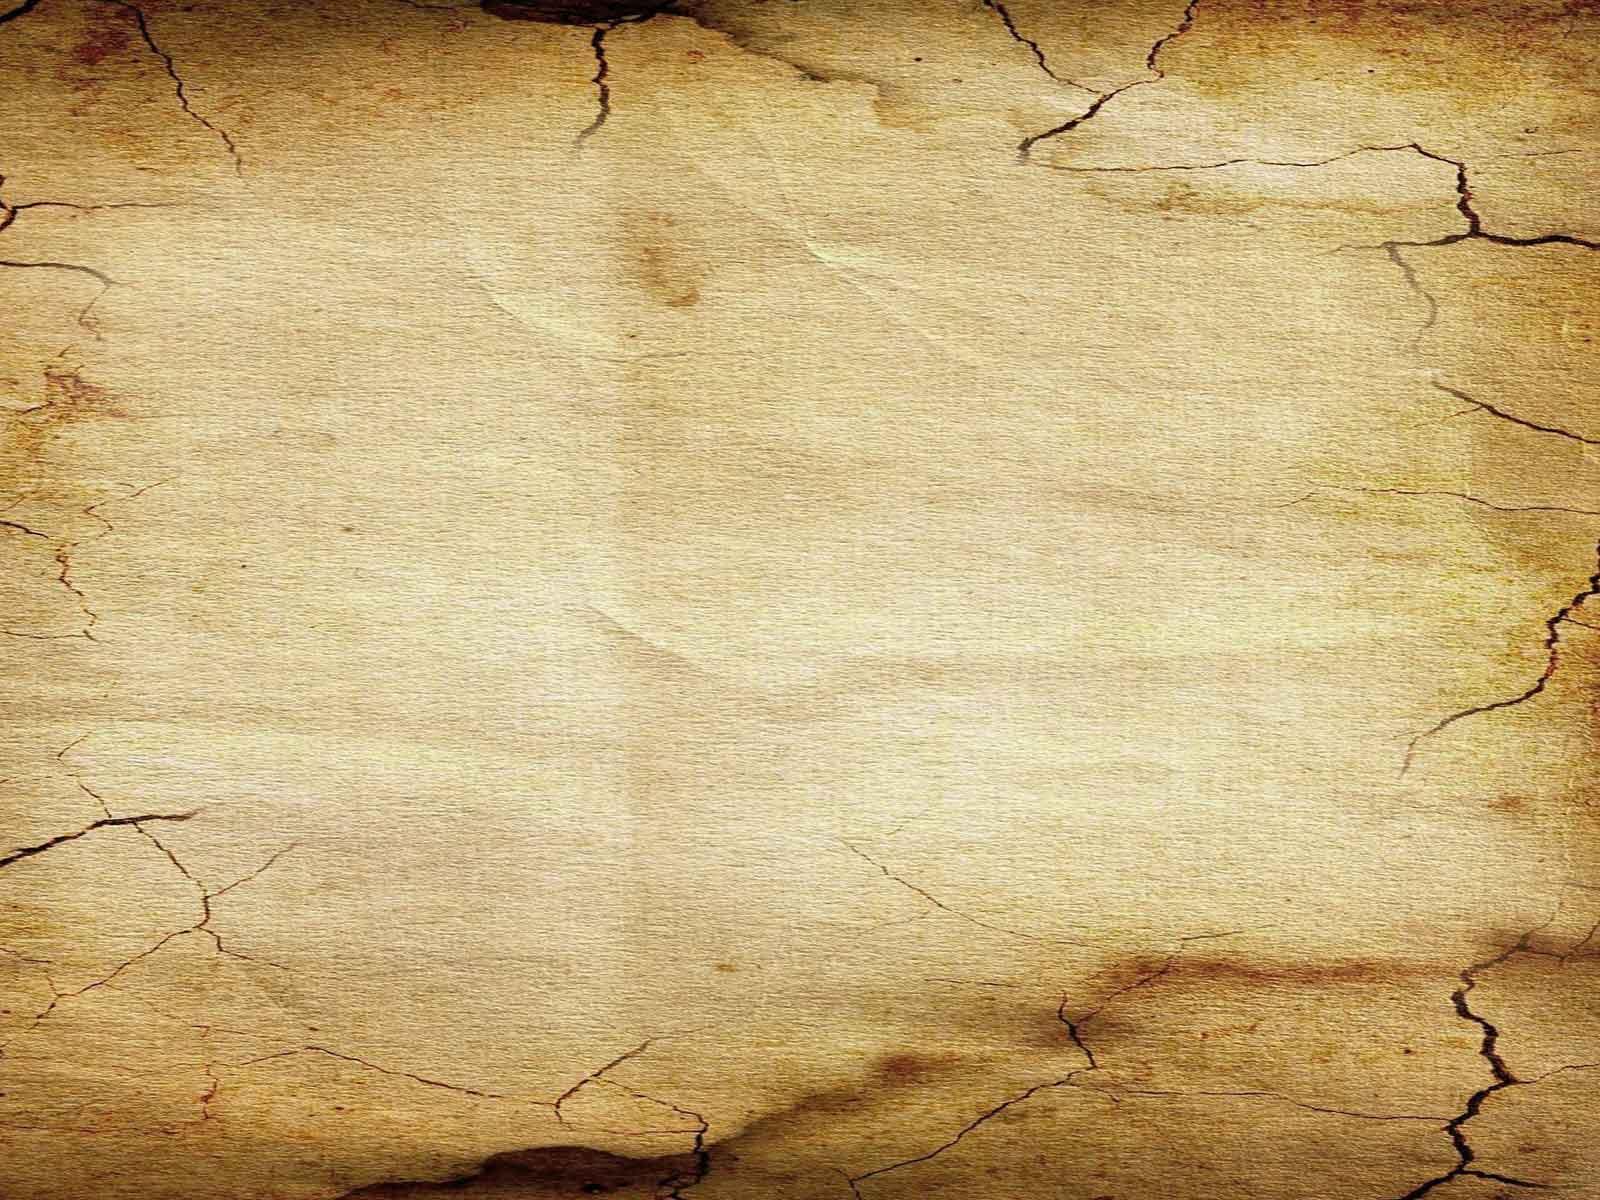 Hdr vintage paper. Background clipart bible